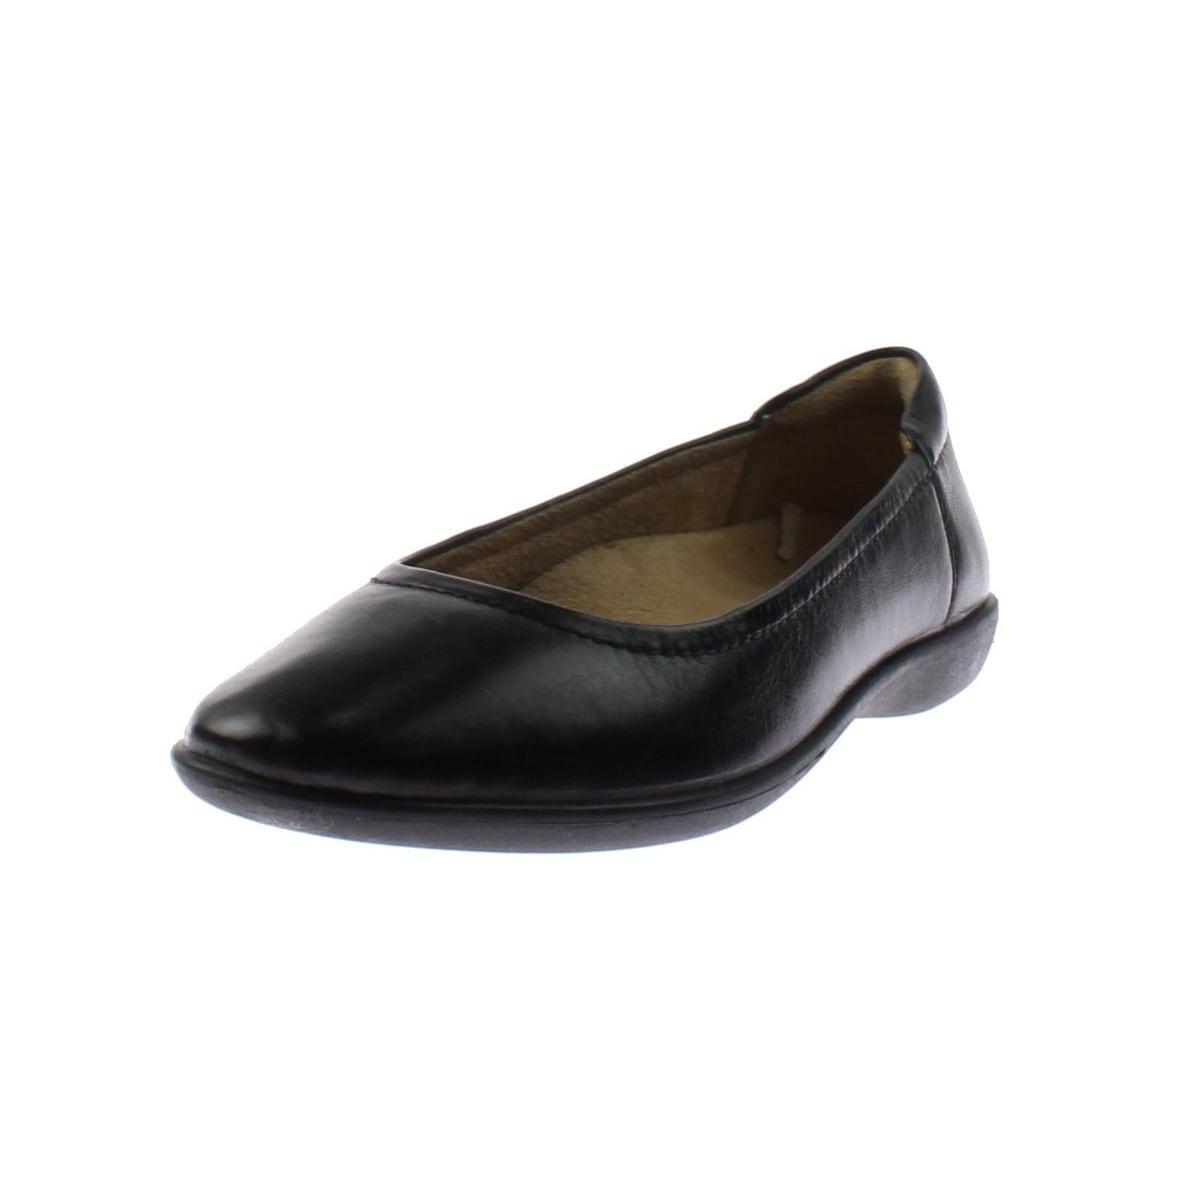 02daa00a7e Buy Naturalizer Women's Flats Online at Overstock   Our Best Women's Shoes  Deals